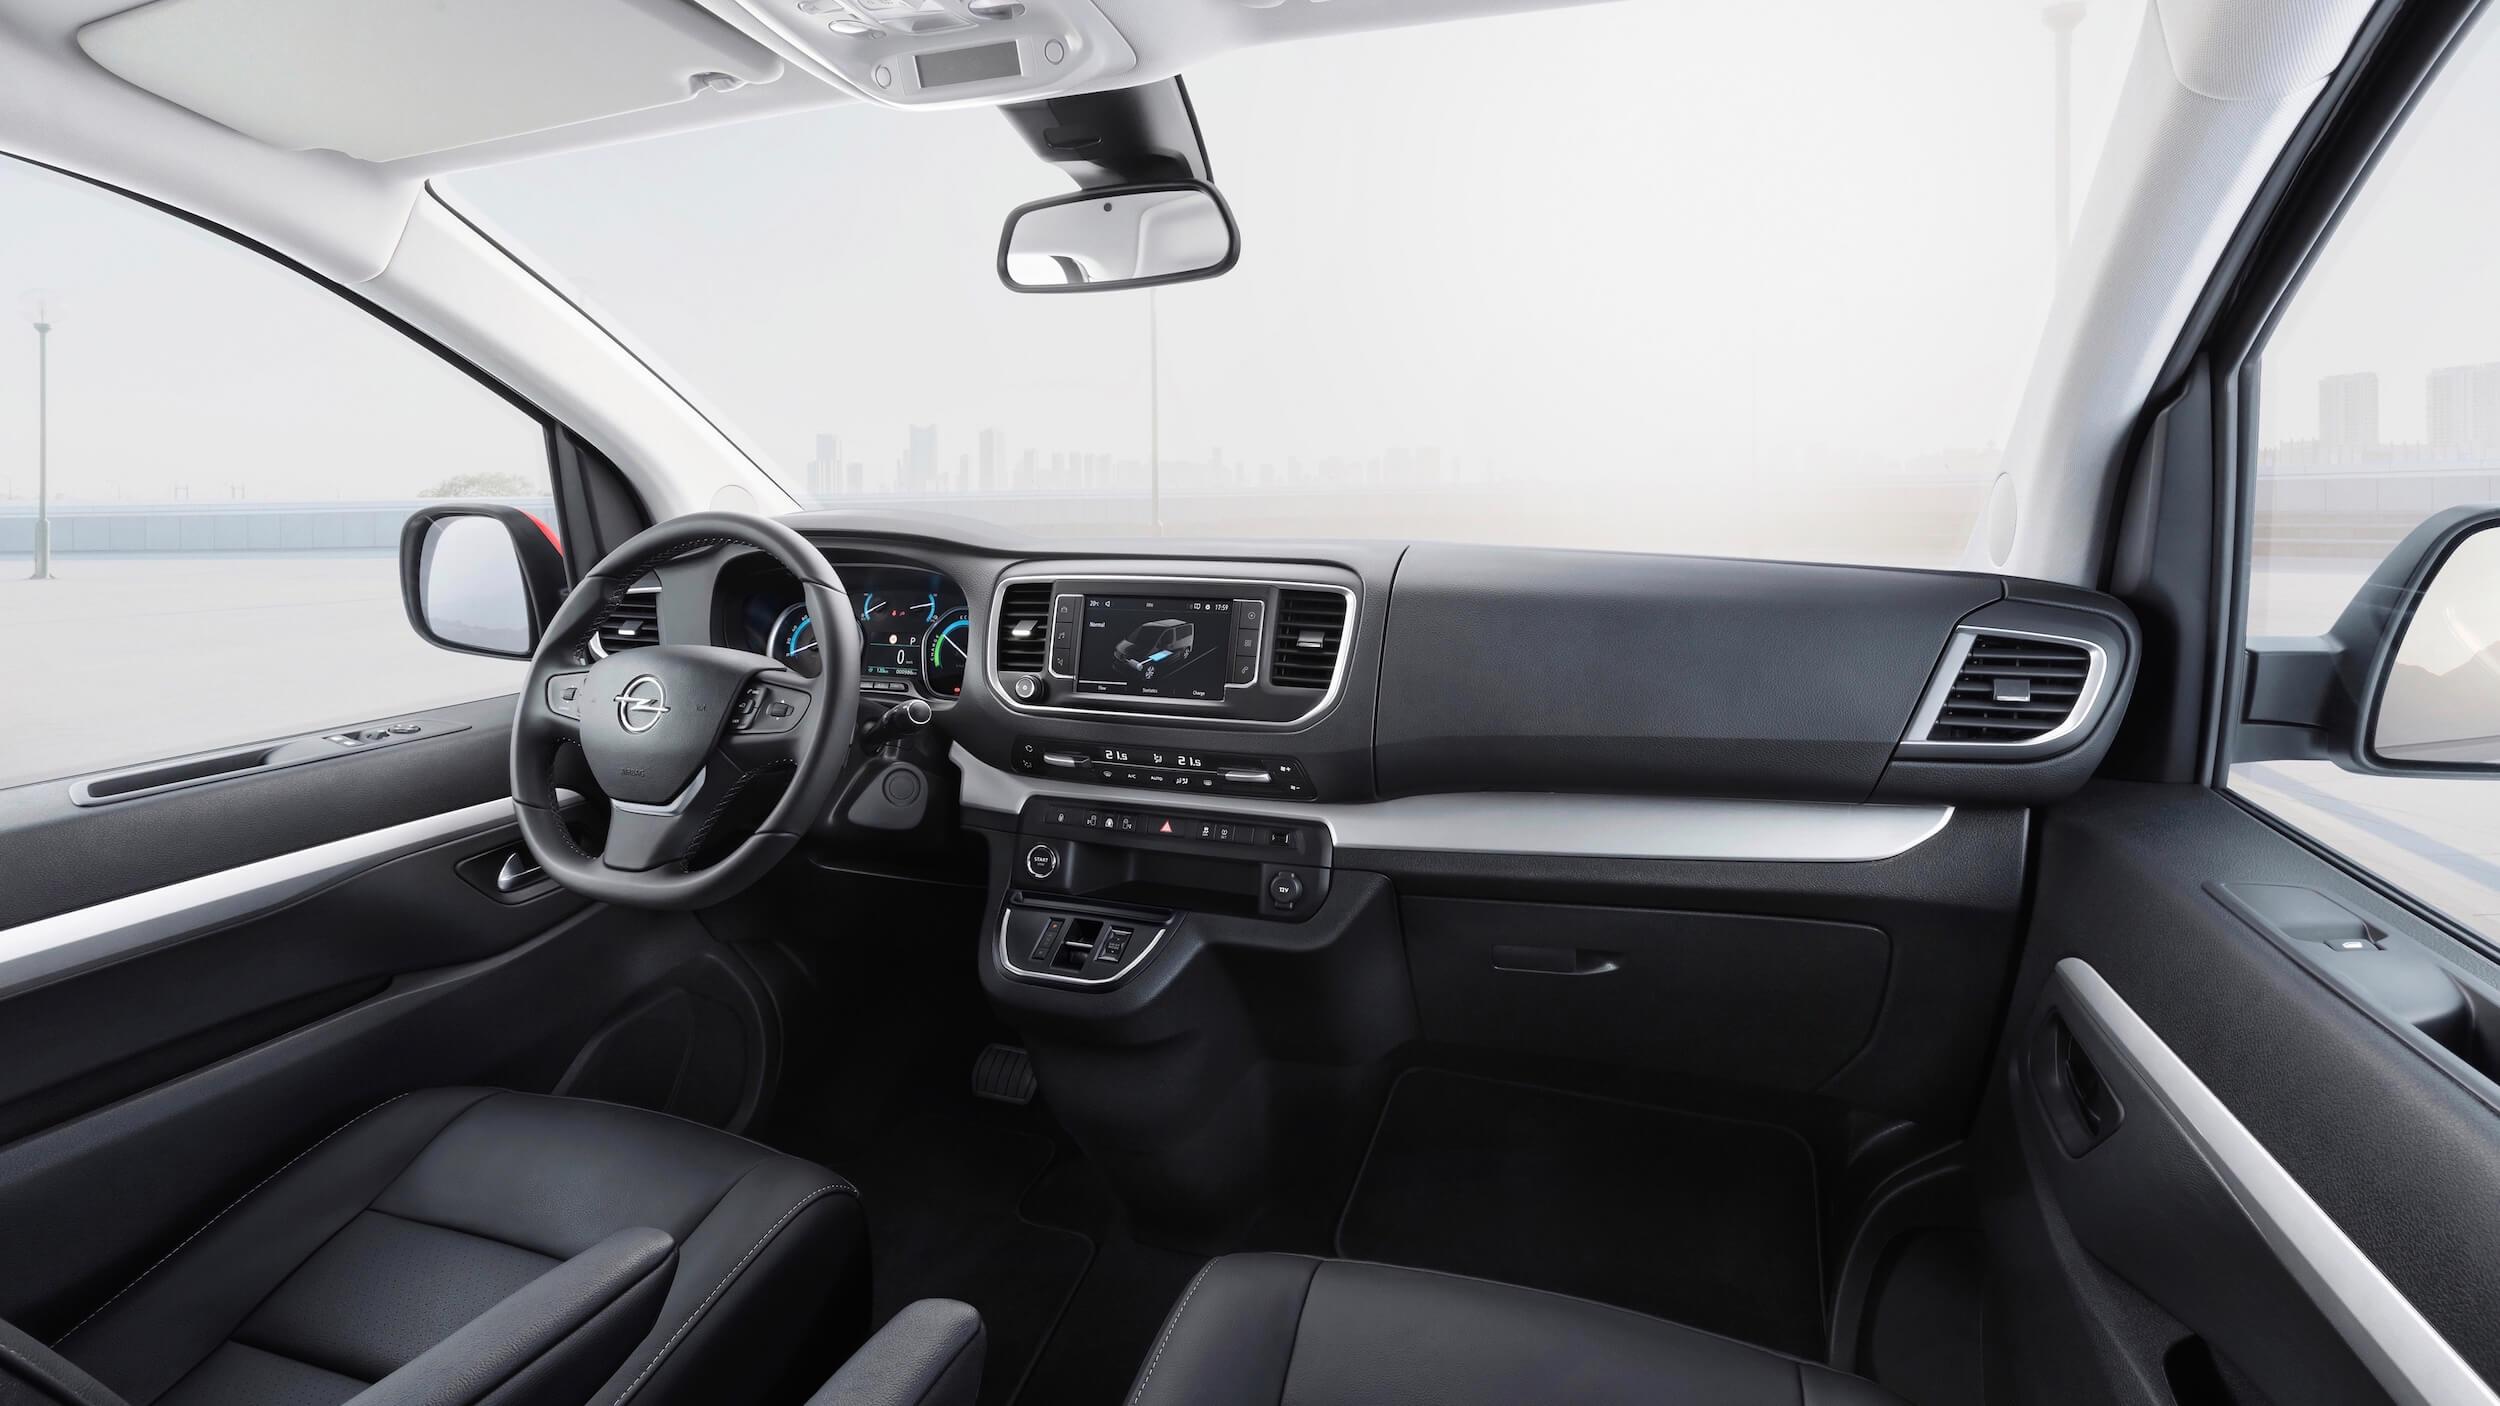 Elektrische Opel Zafira interieur